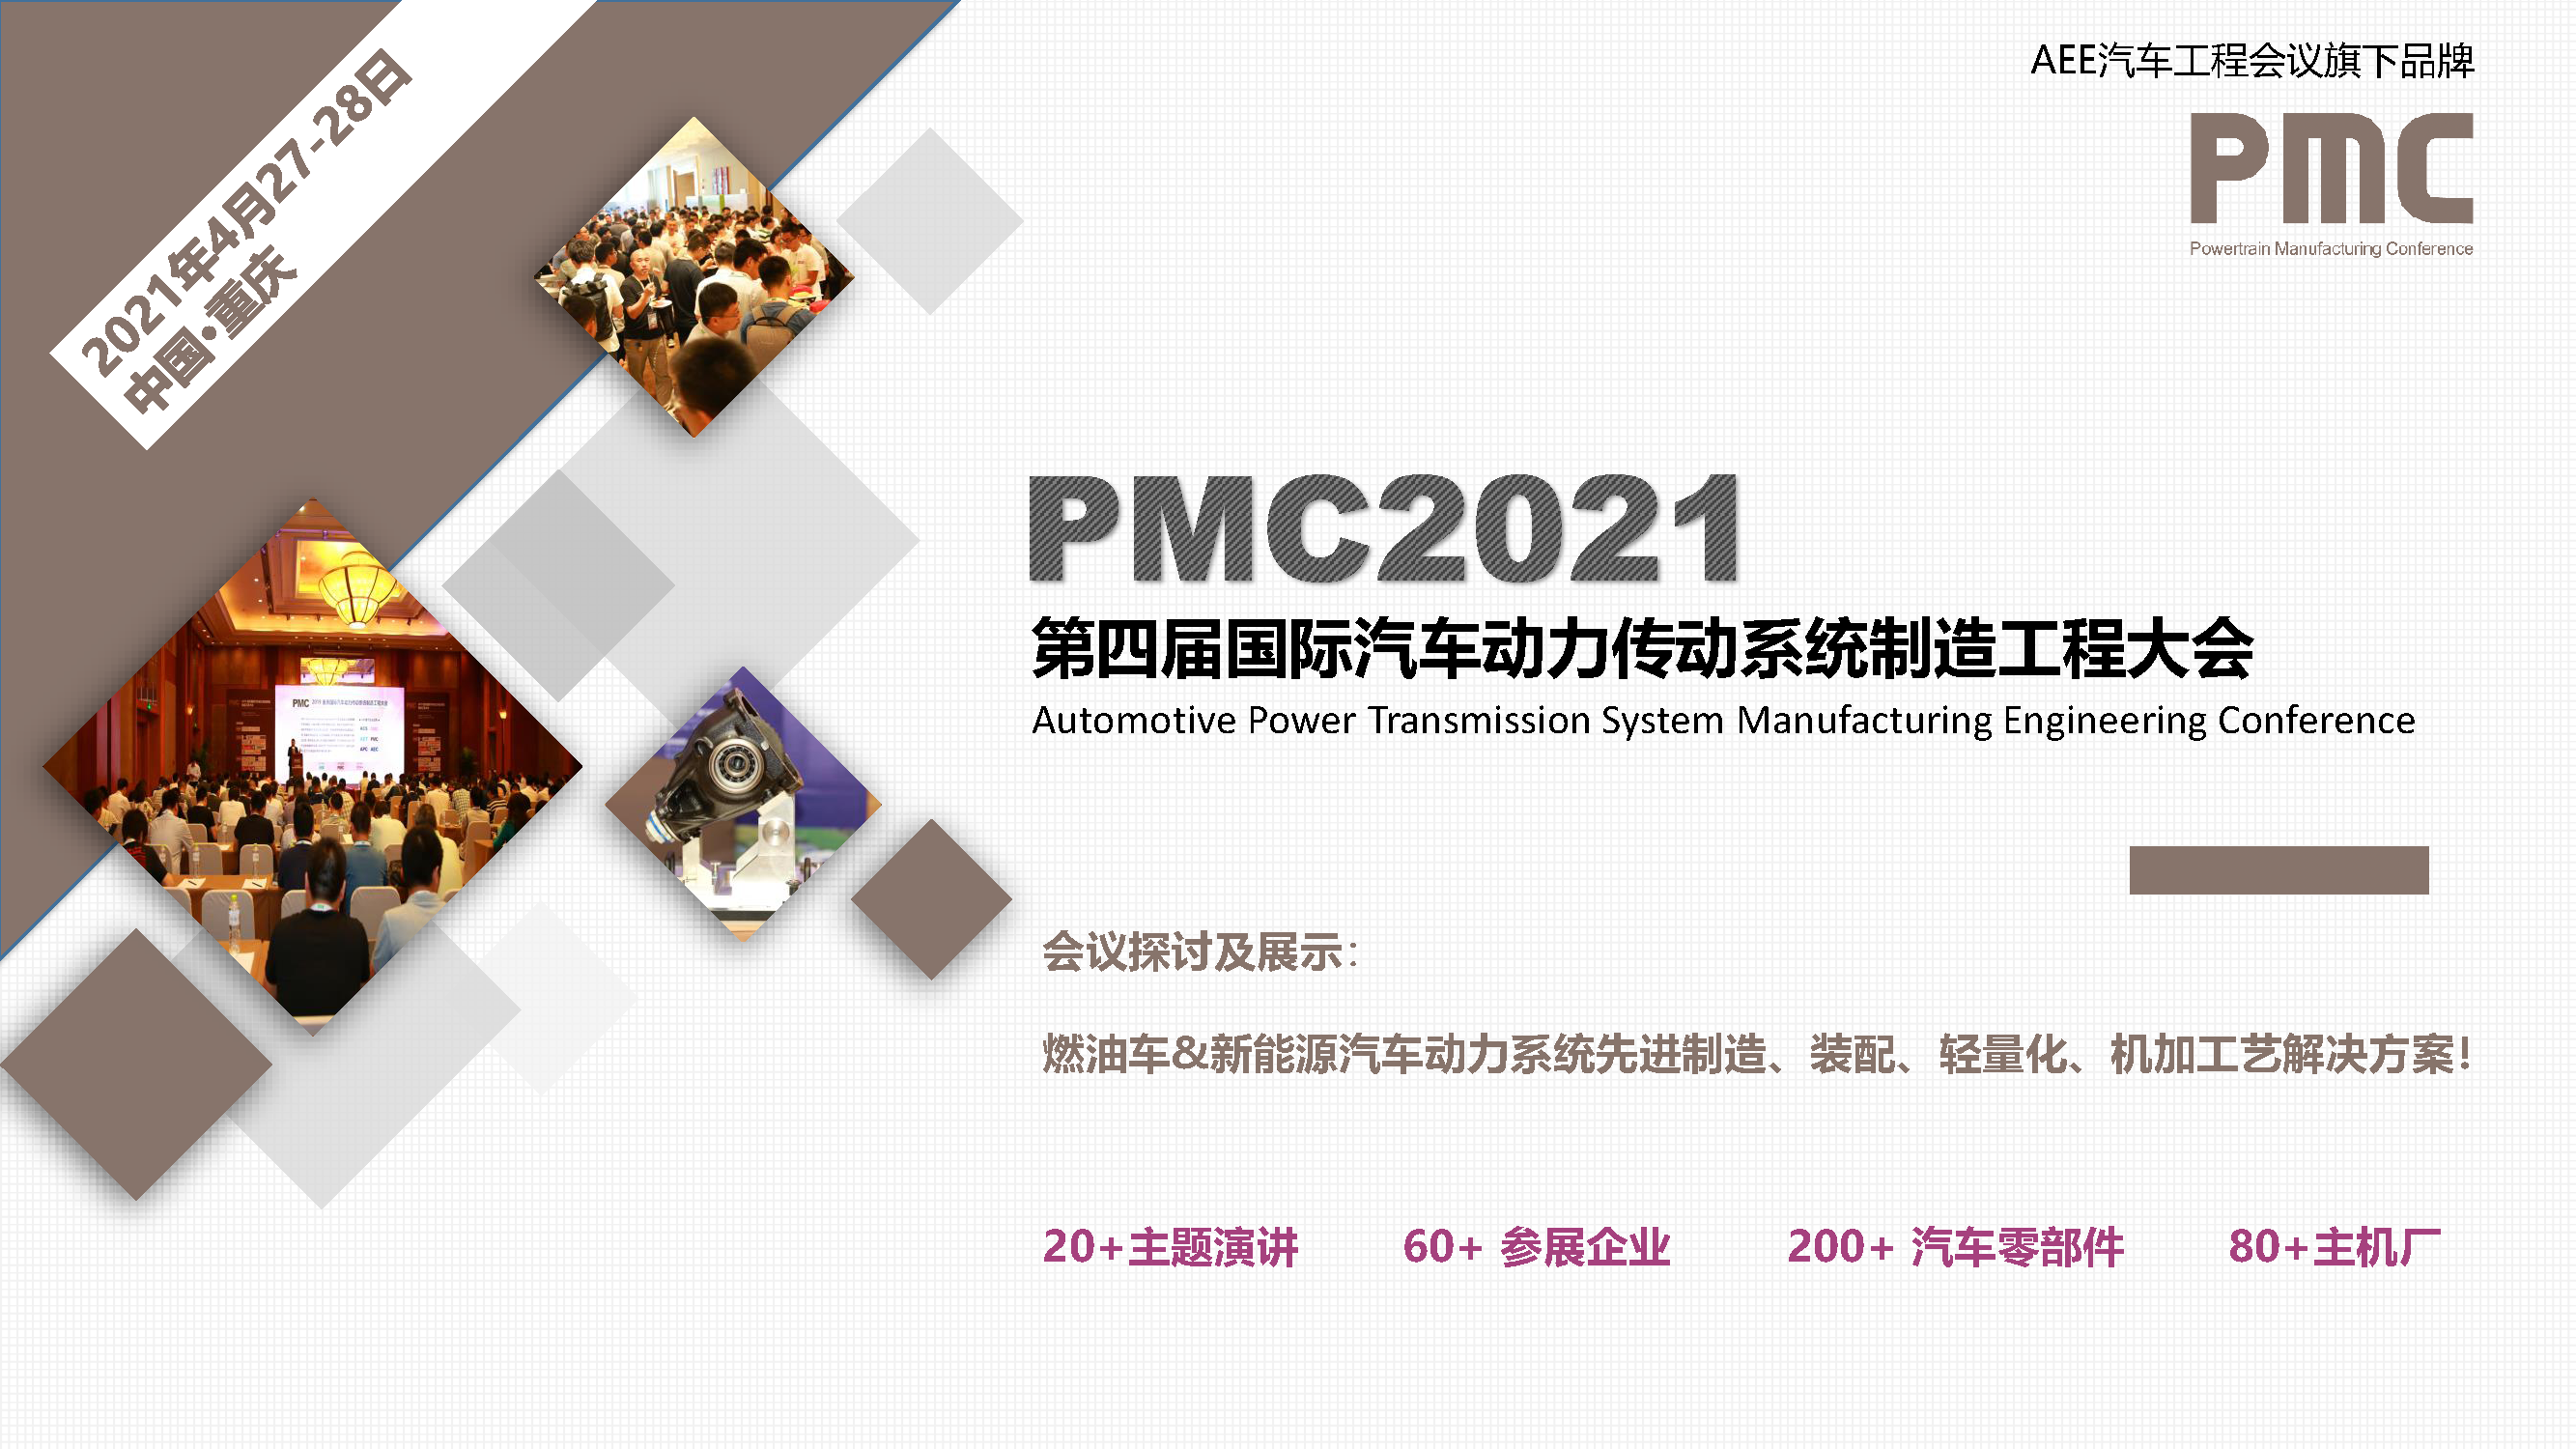 PMC2021第四屆(重慶)國際汽車動力傳動系統制造工程大會